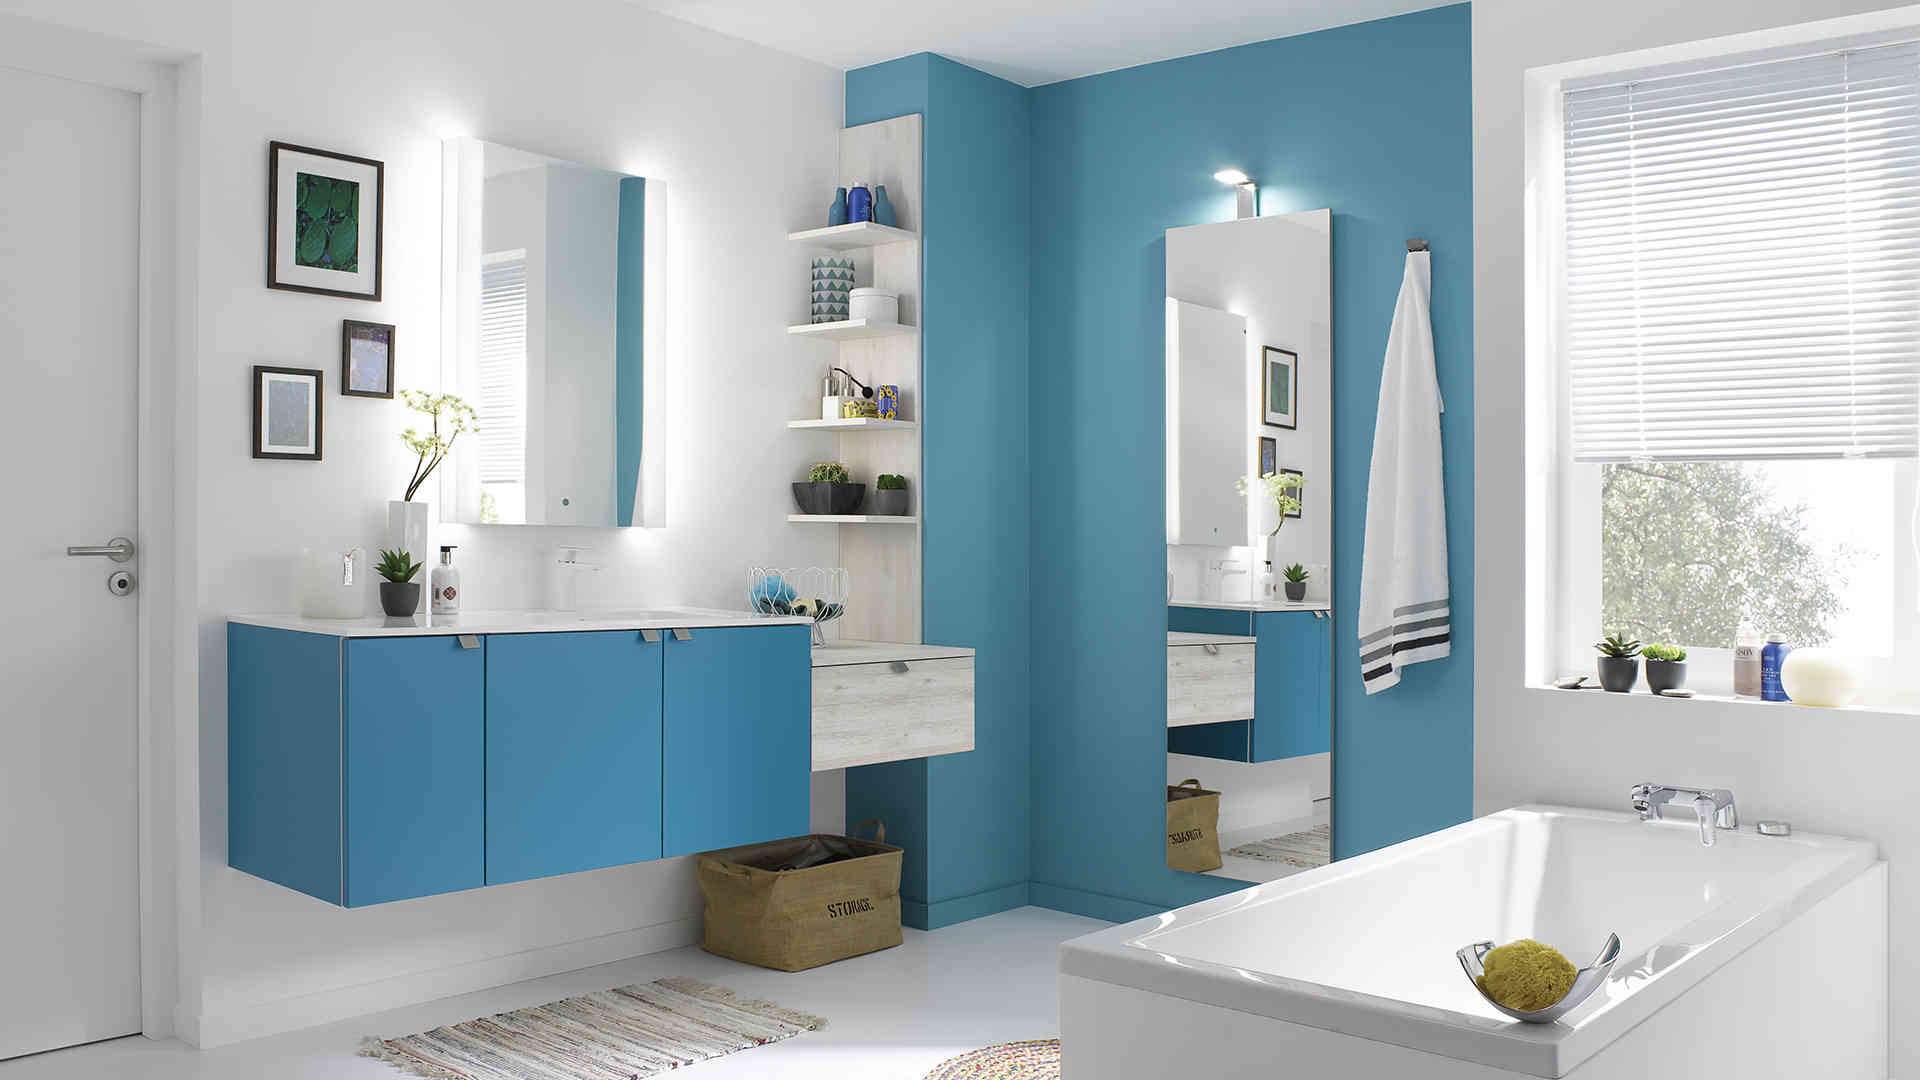 Alternative Carrelage Mural Salle De Bain prix salle de bain | tarif moyen et devis gratuit en ligne